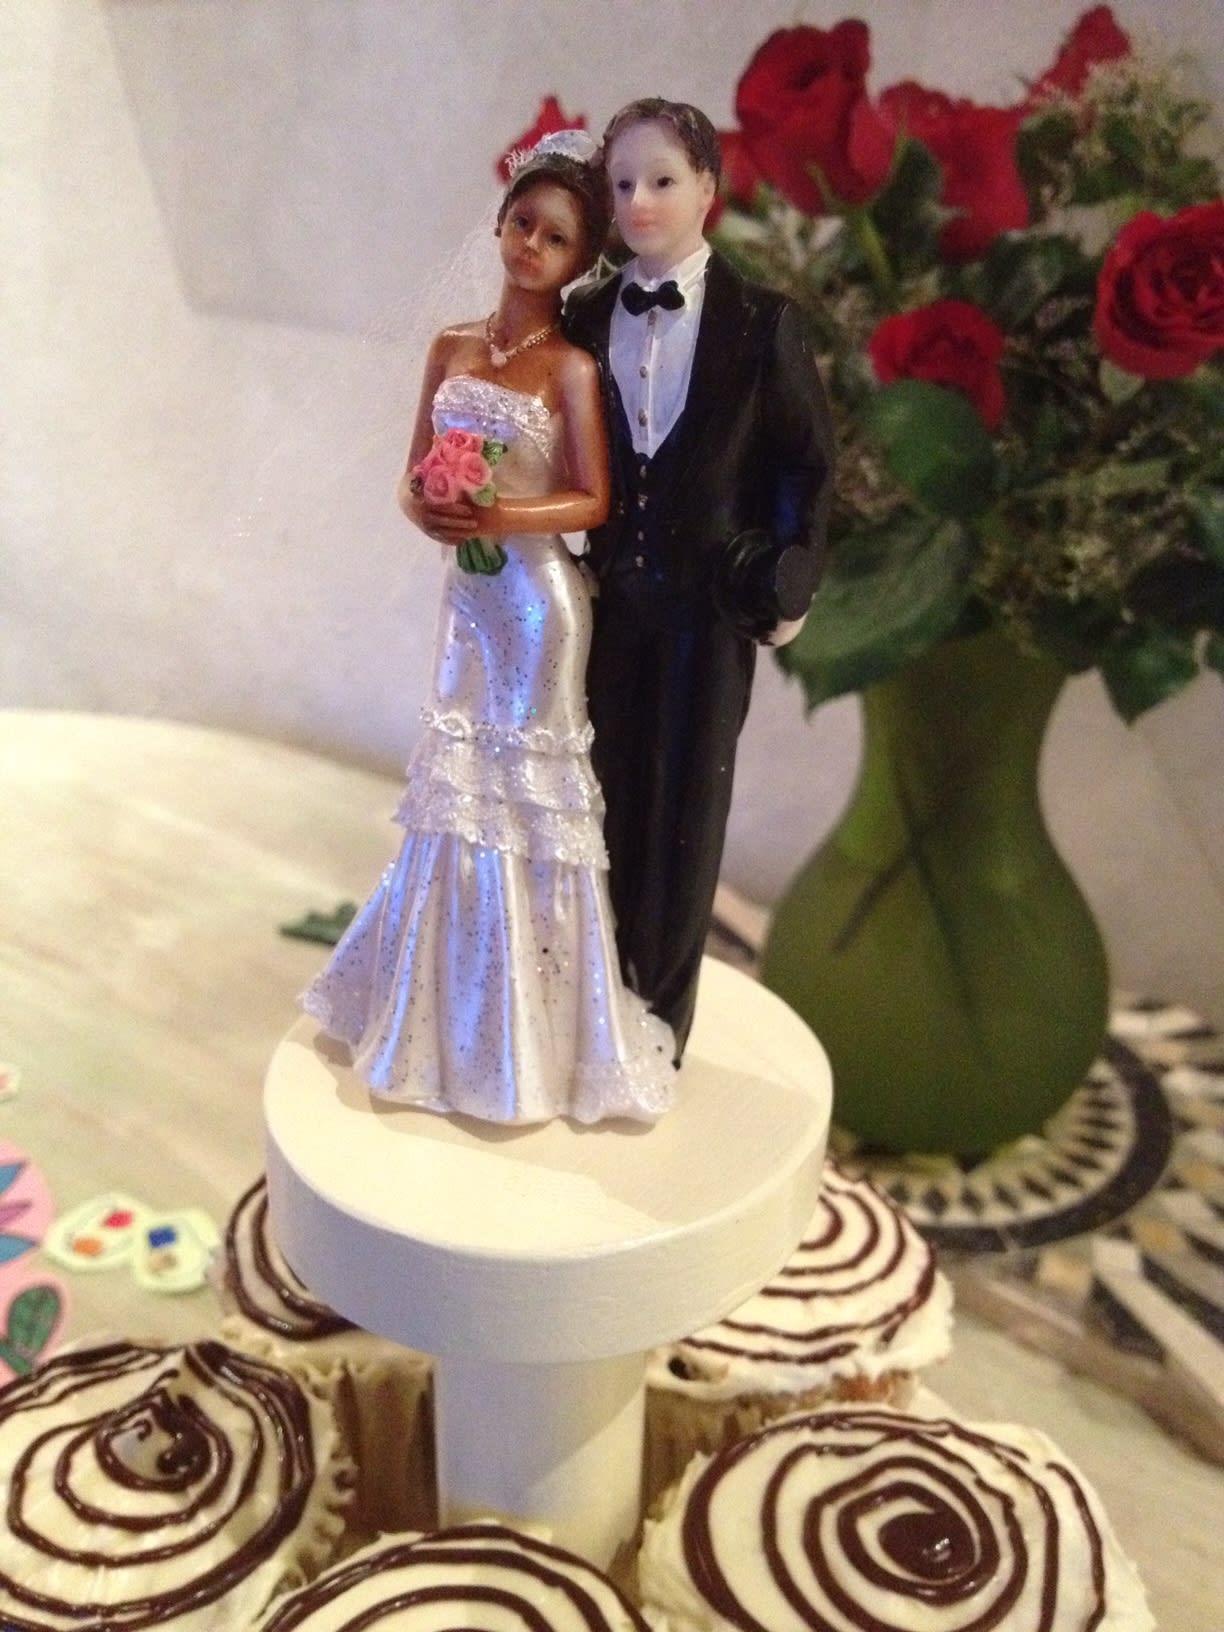 Celebrating our wedding anniversary